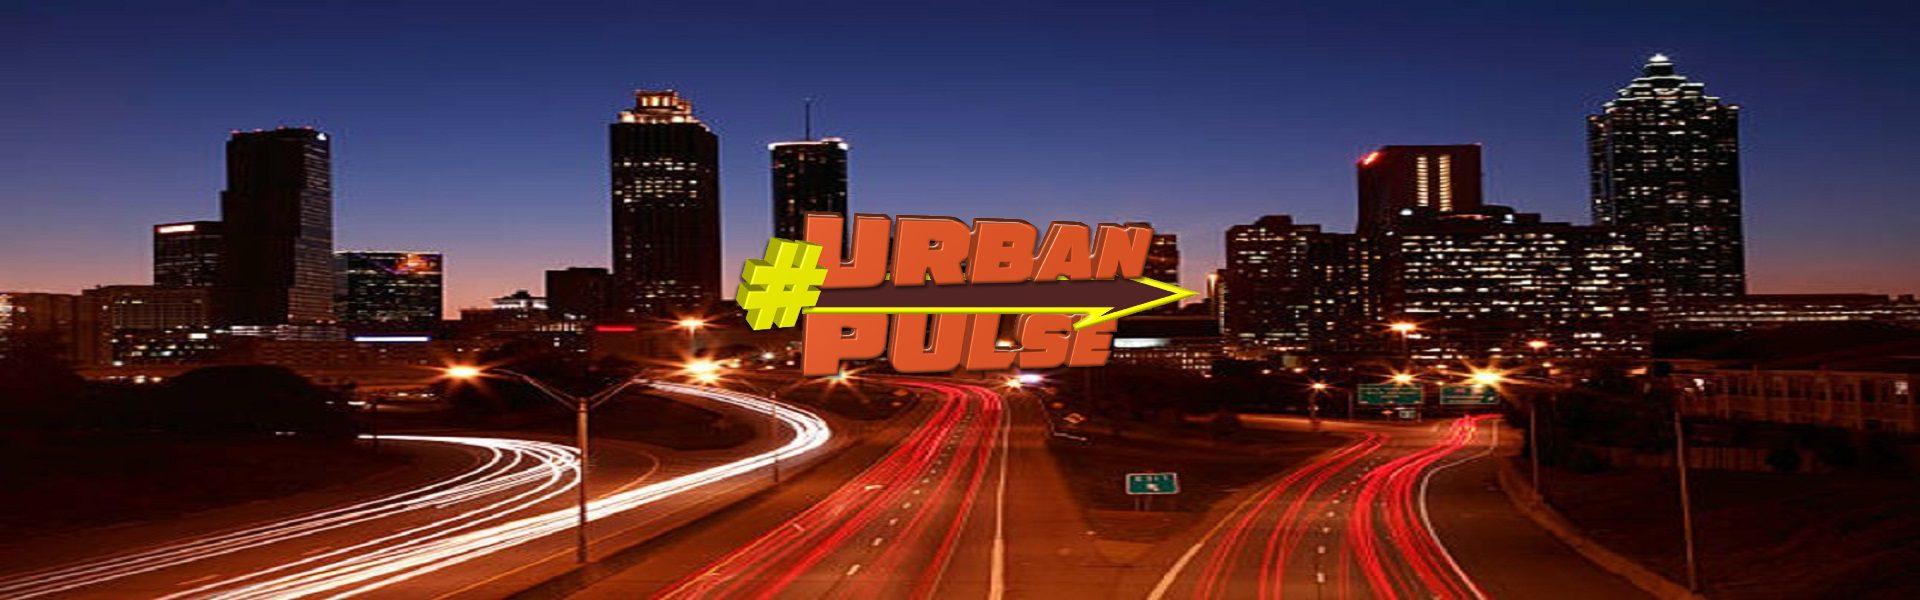 #Urbanpulse